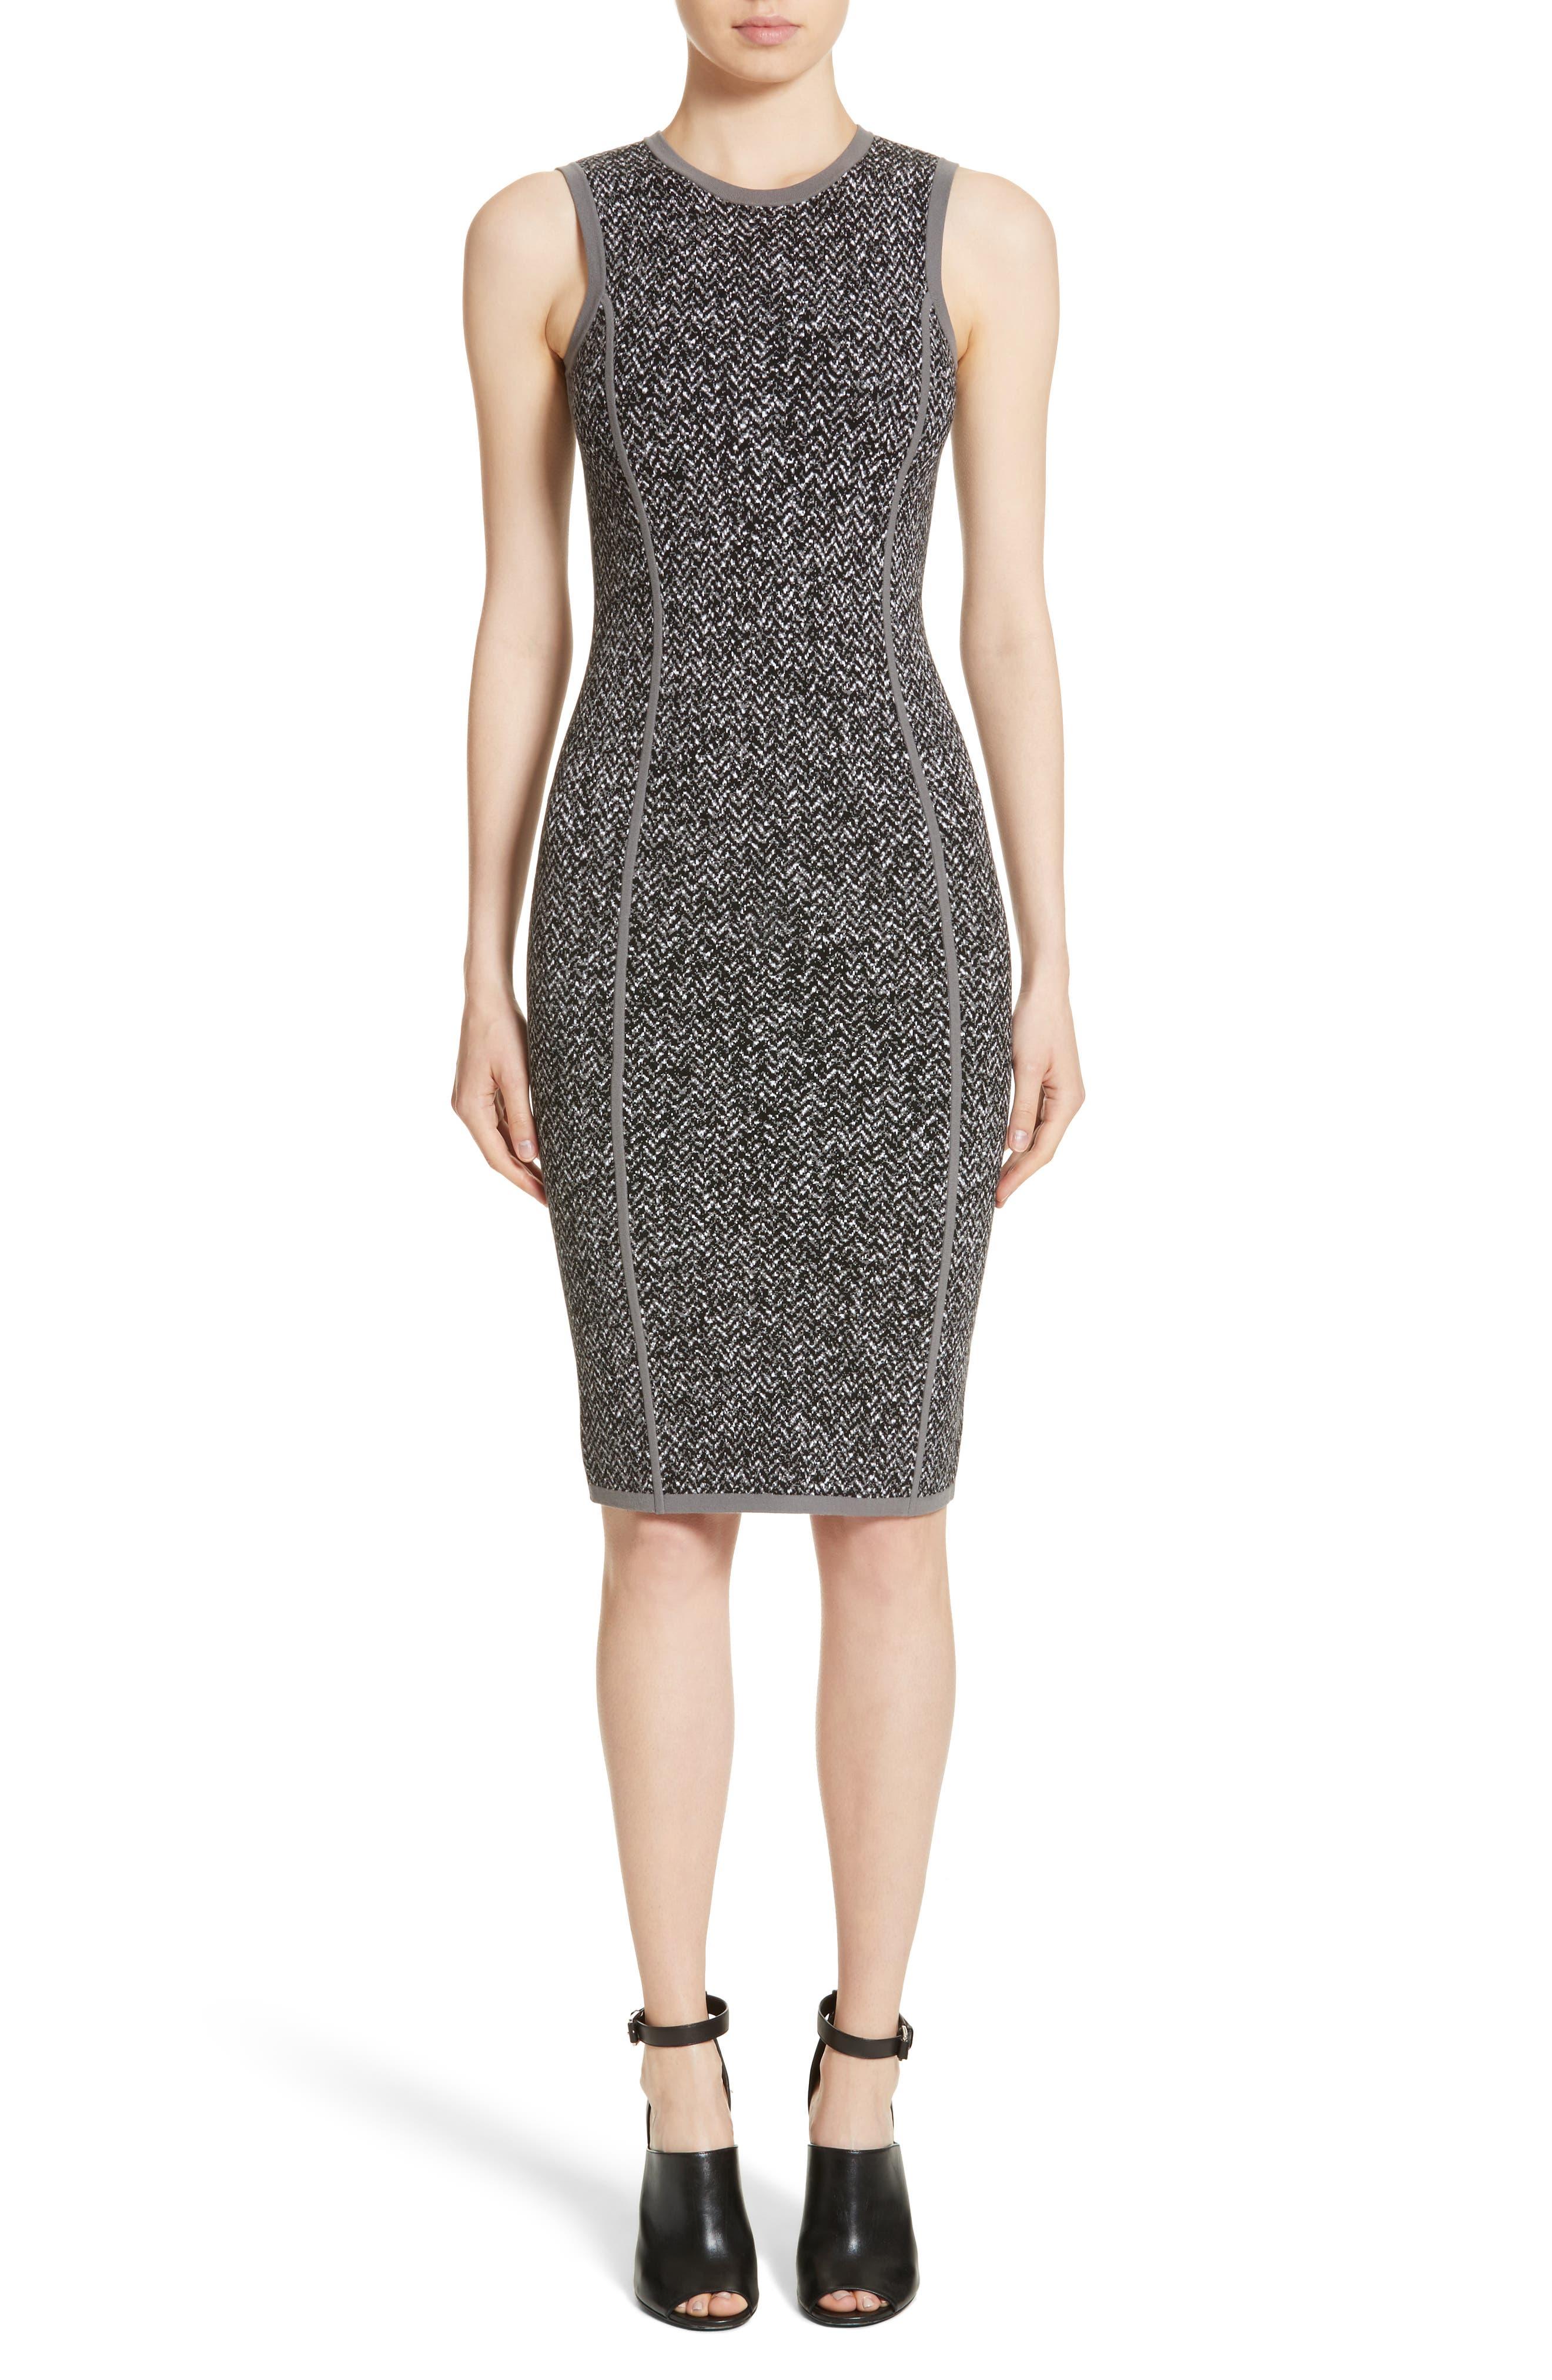 Alternate Image 1 Selected - Michael Kors Stretch Tweed Jacquard Sheath Dress